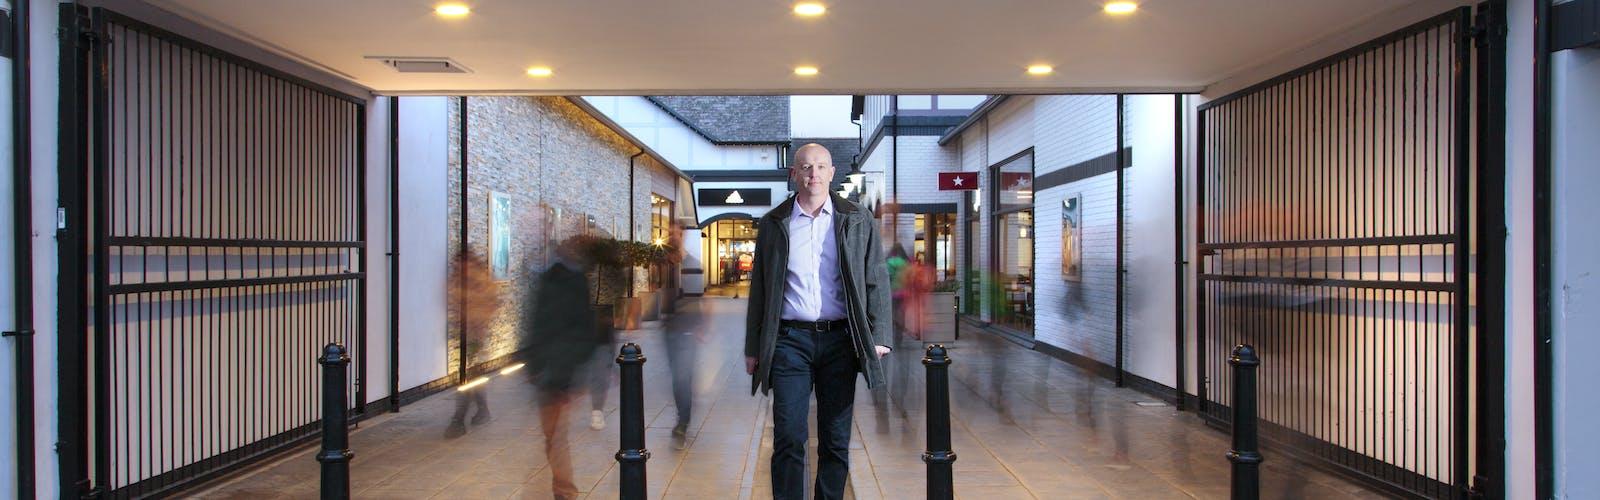 High street retailer case study